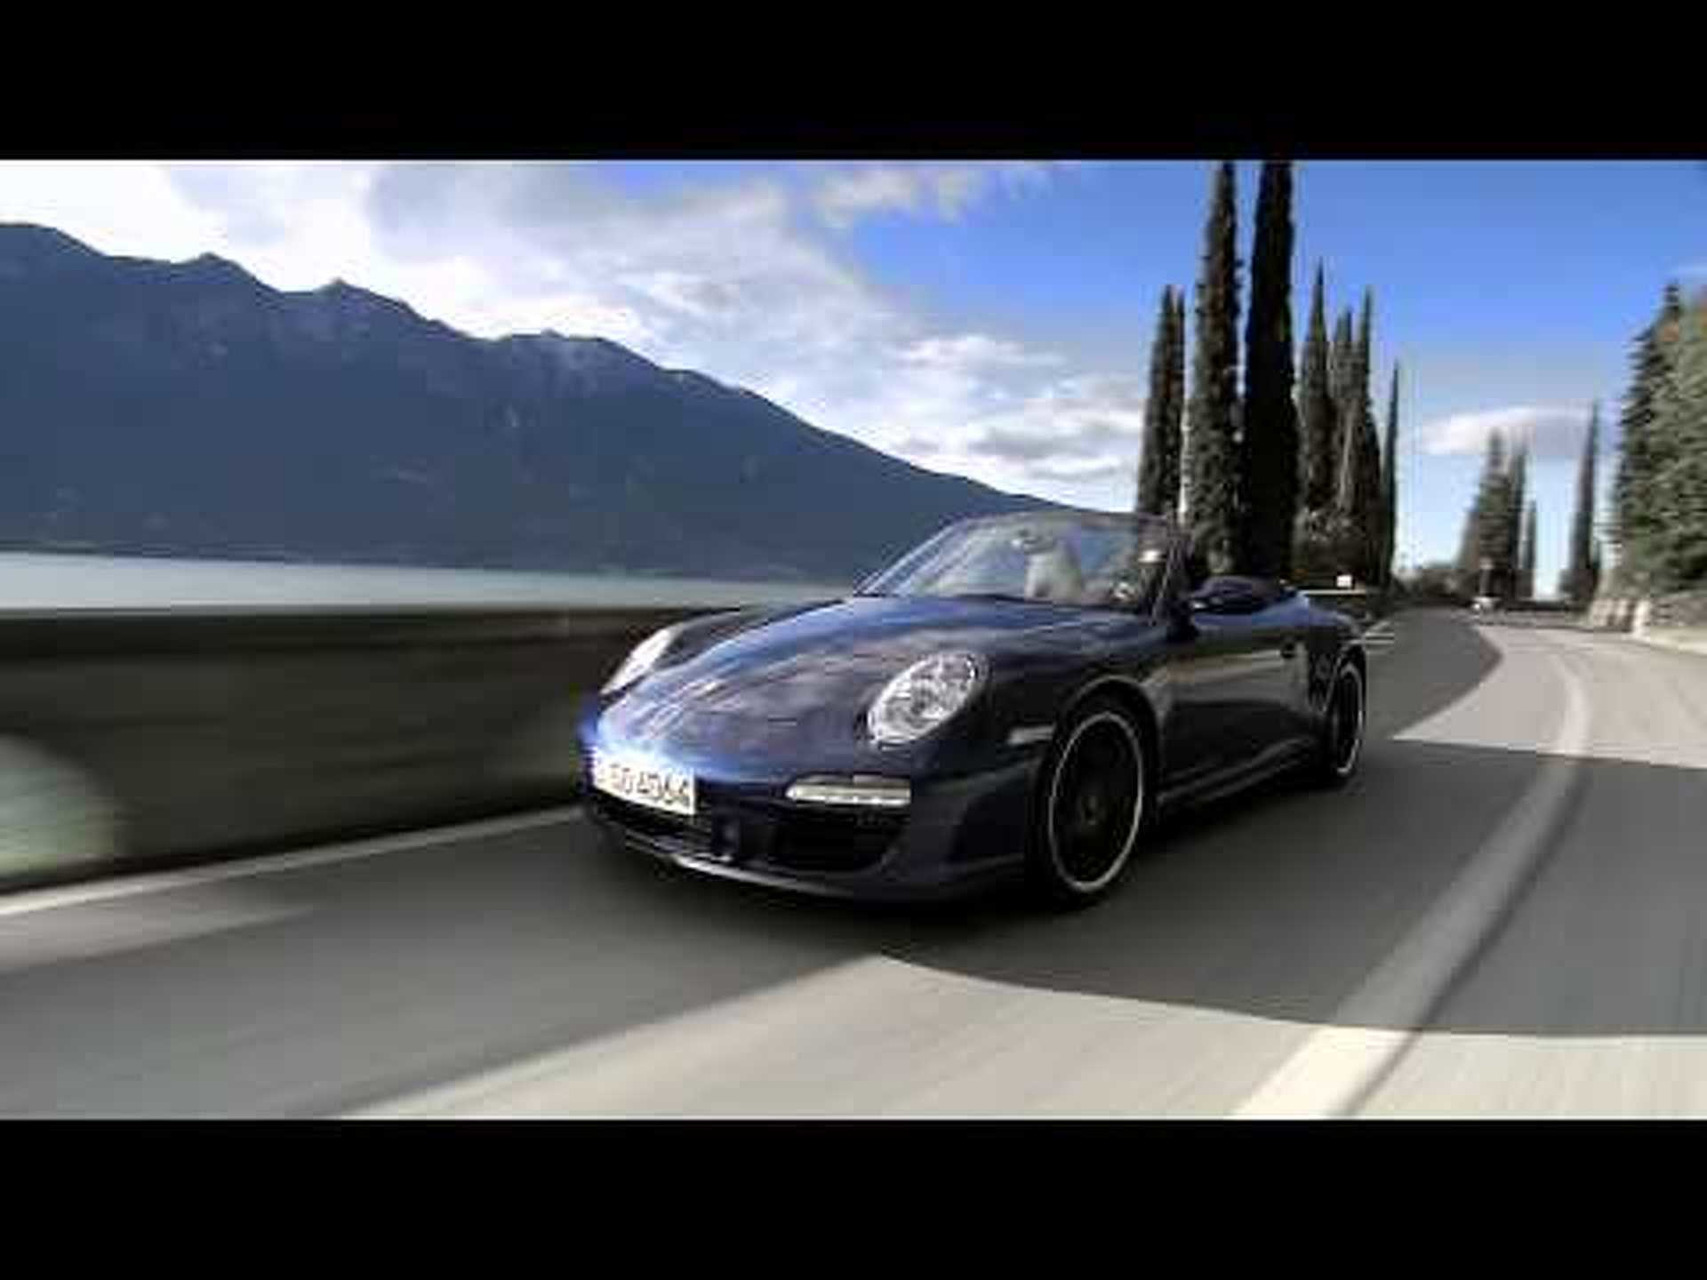 2011 Porsche Carrera GTS